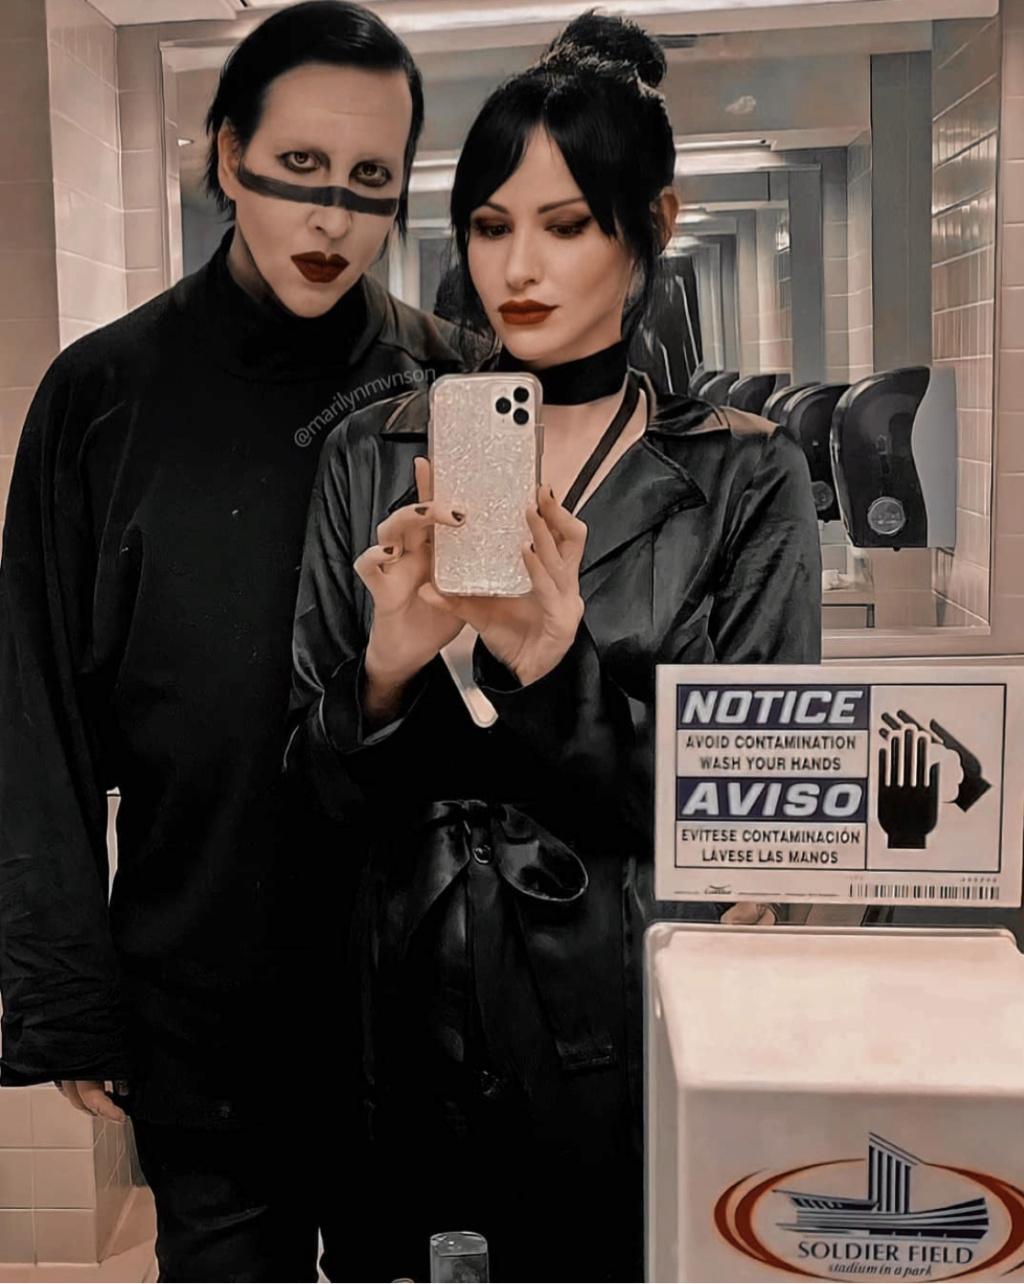 Marilyn ⚡️ Manson (el tópic del Reverendo) - Página 6 08604110